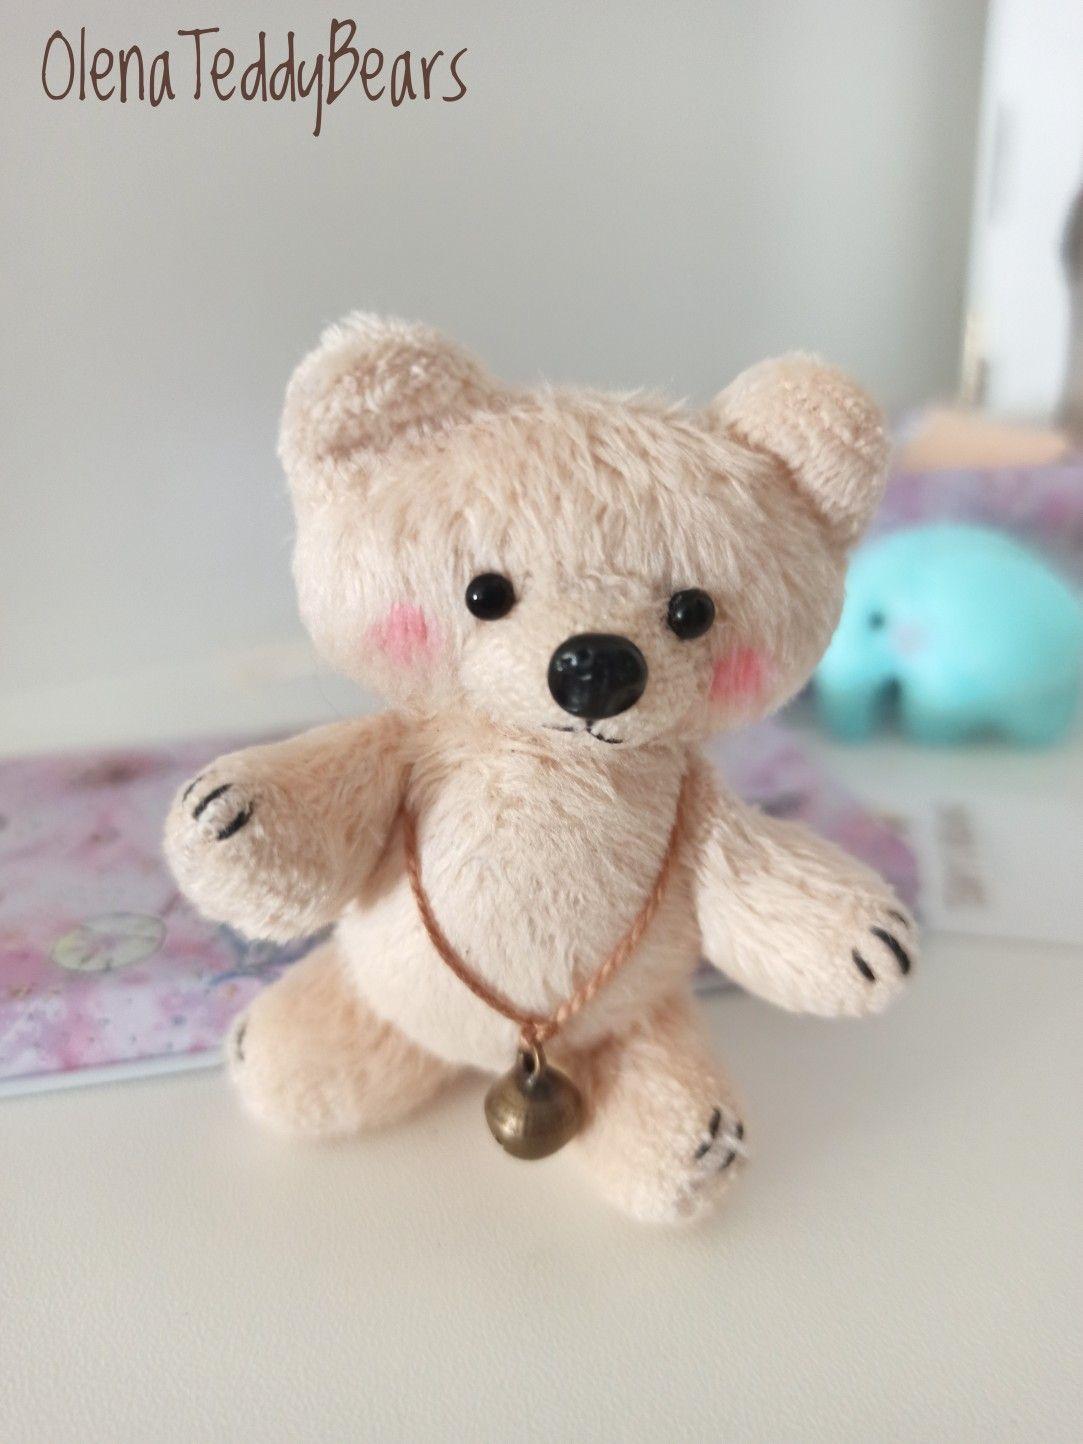 Plush Bear Toy Miniature Plush Small Stuffed Animal Travel Etsy Bear Toy Small Stuffed Animals Bear Plush [ 1444 x 1083 Pixel ]